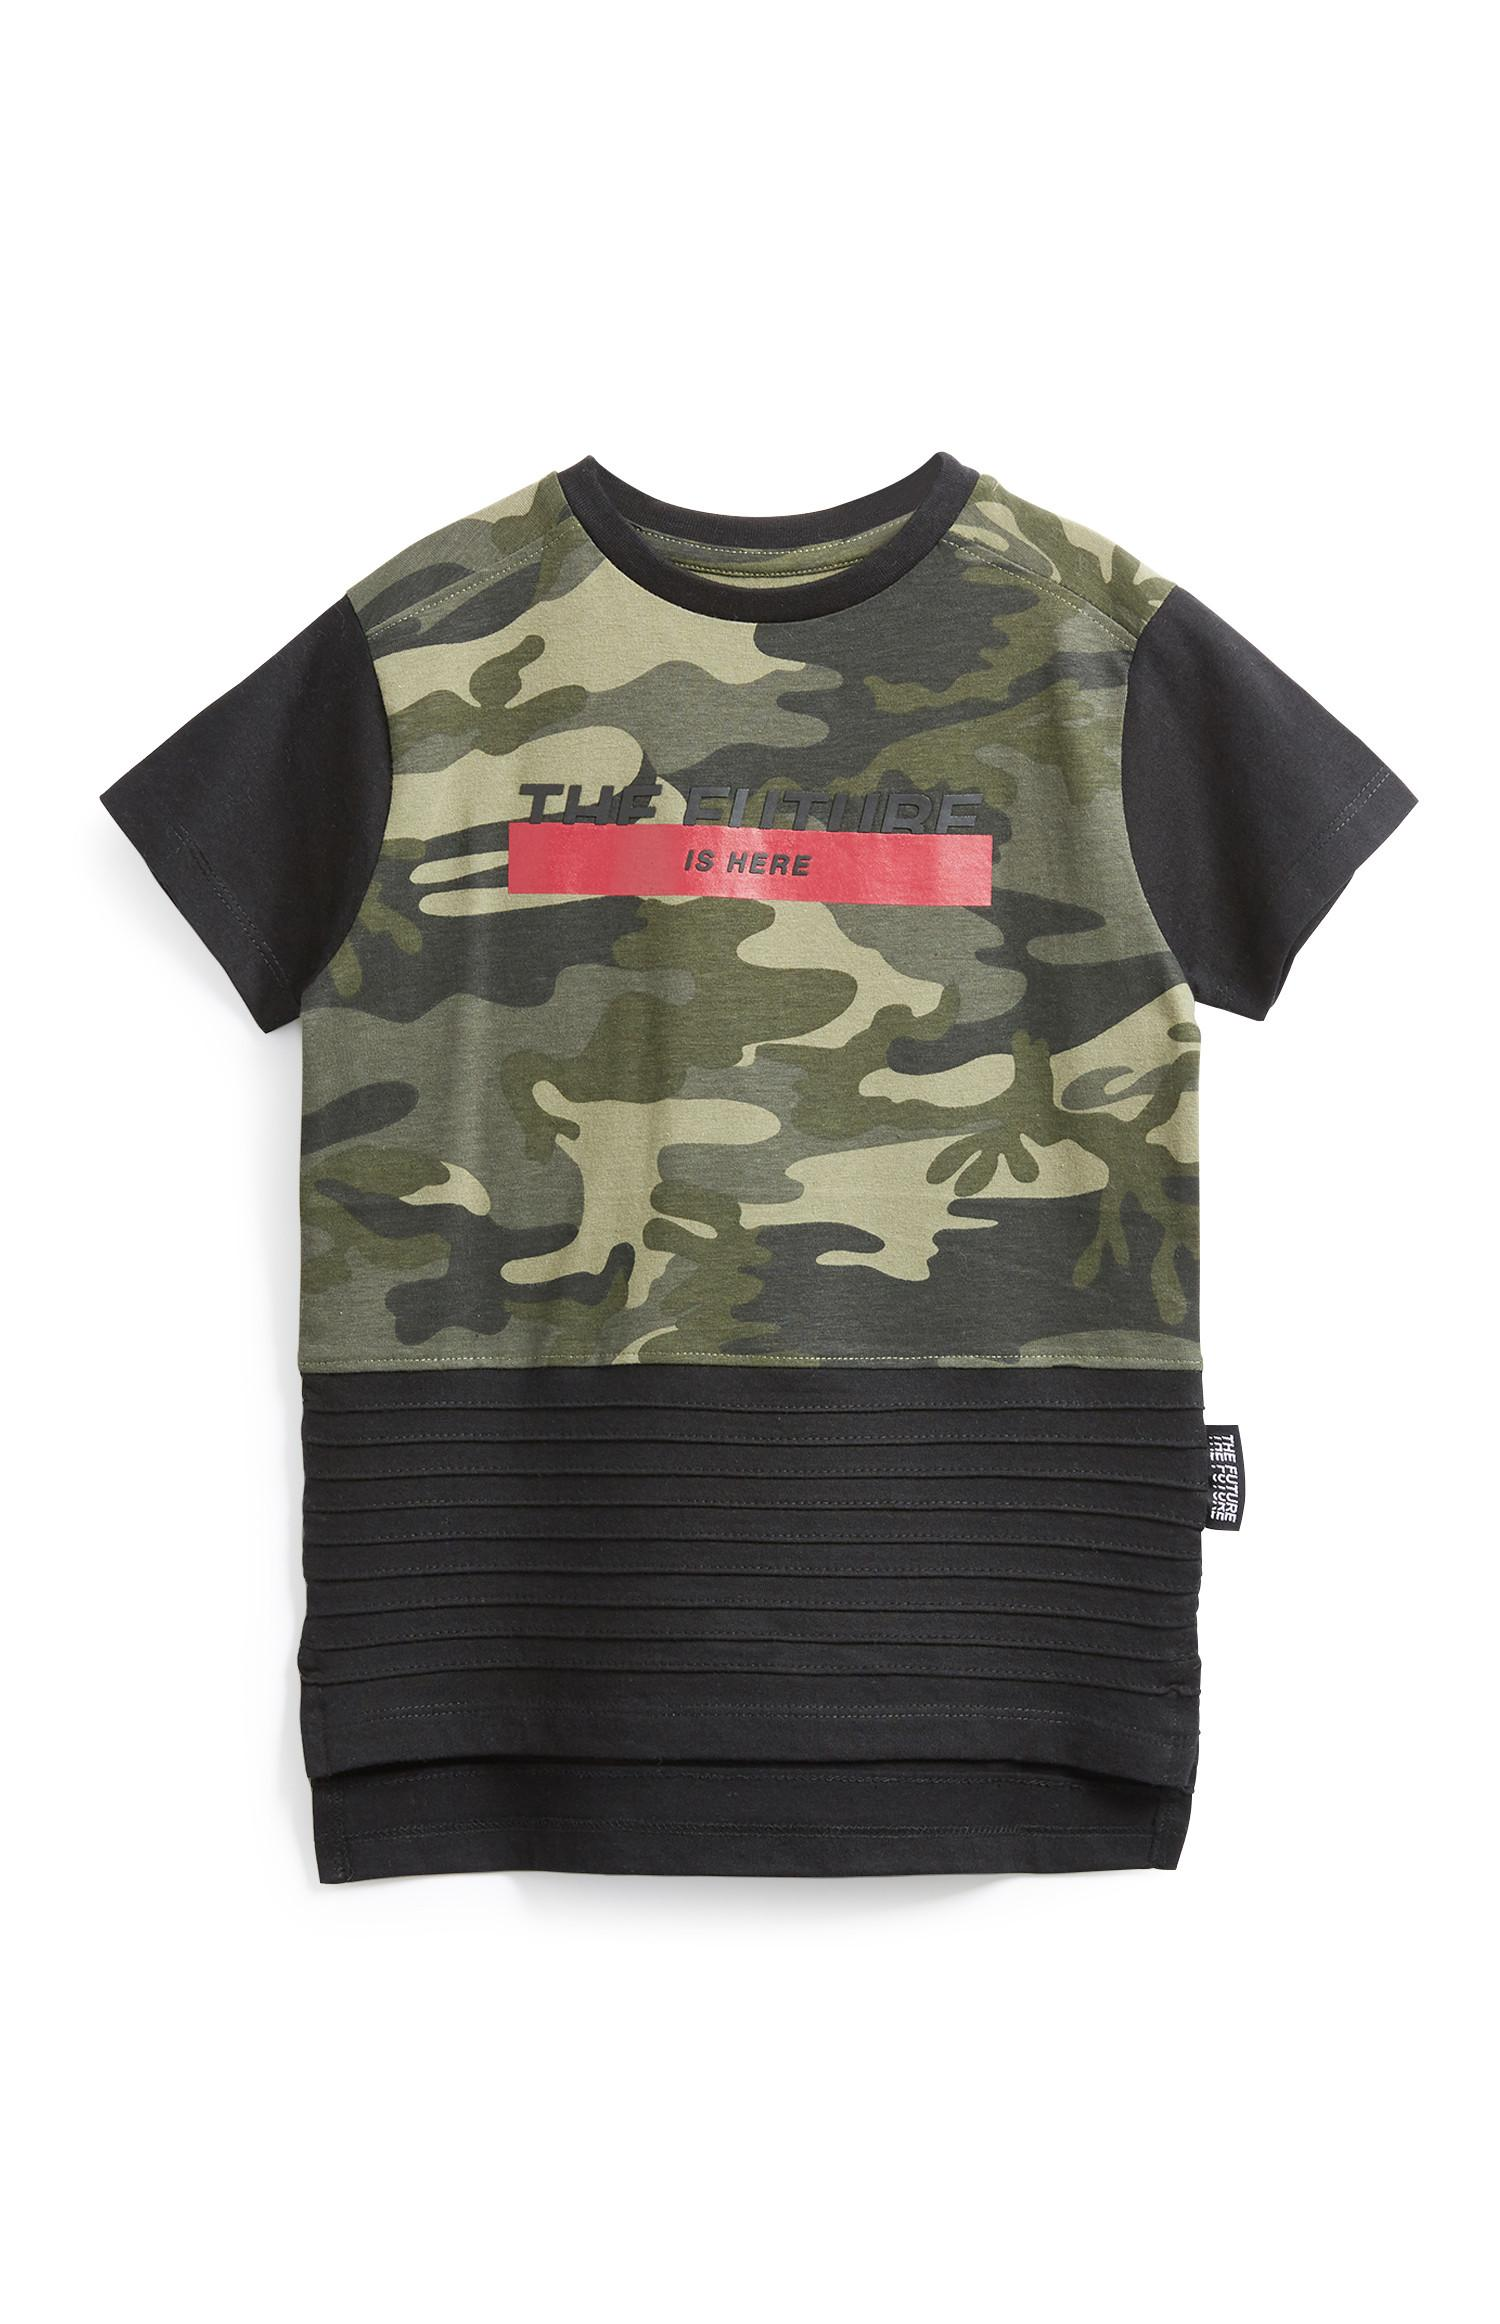 Younger Boy Camo T-Shirt